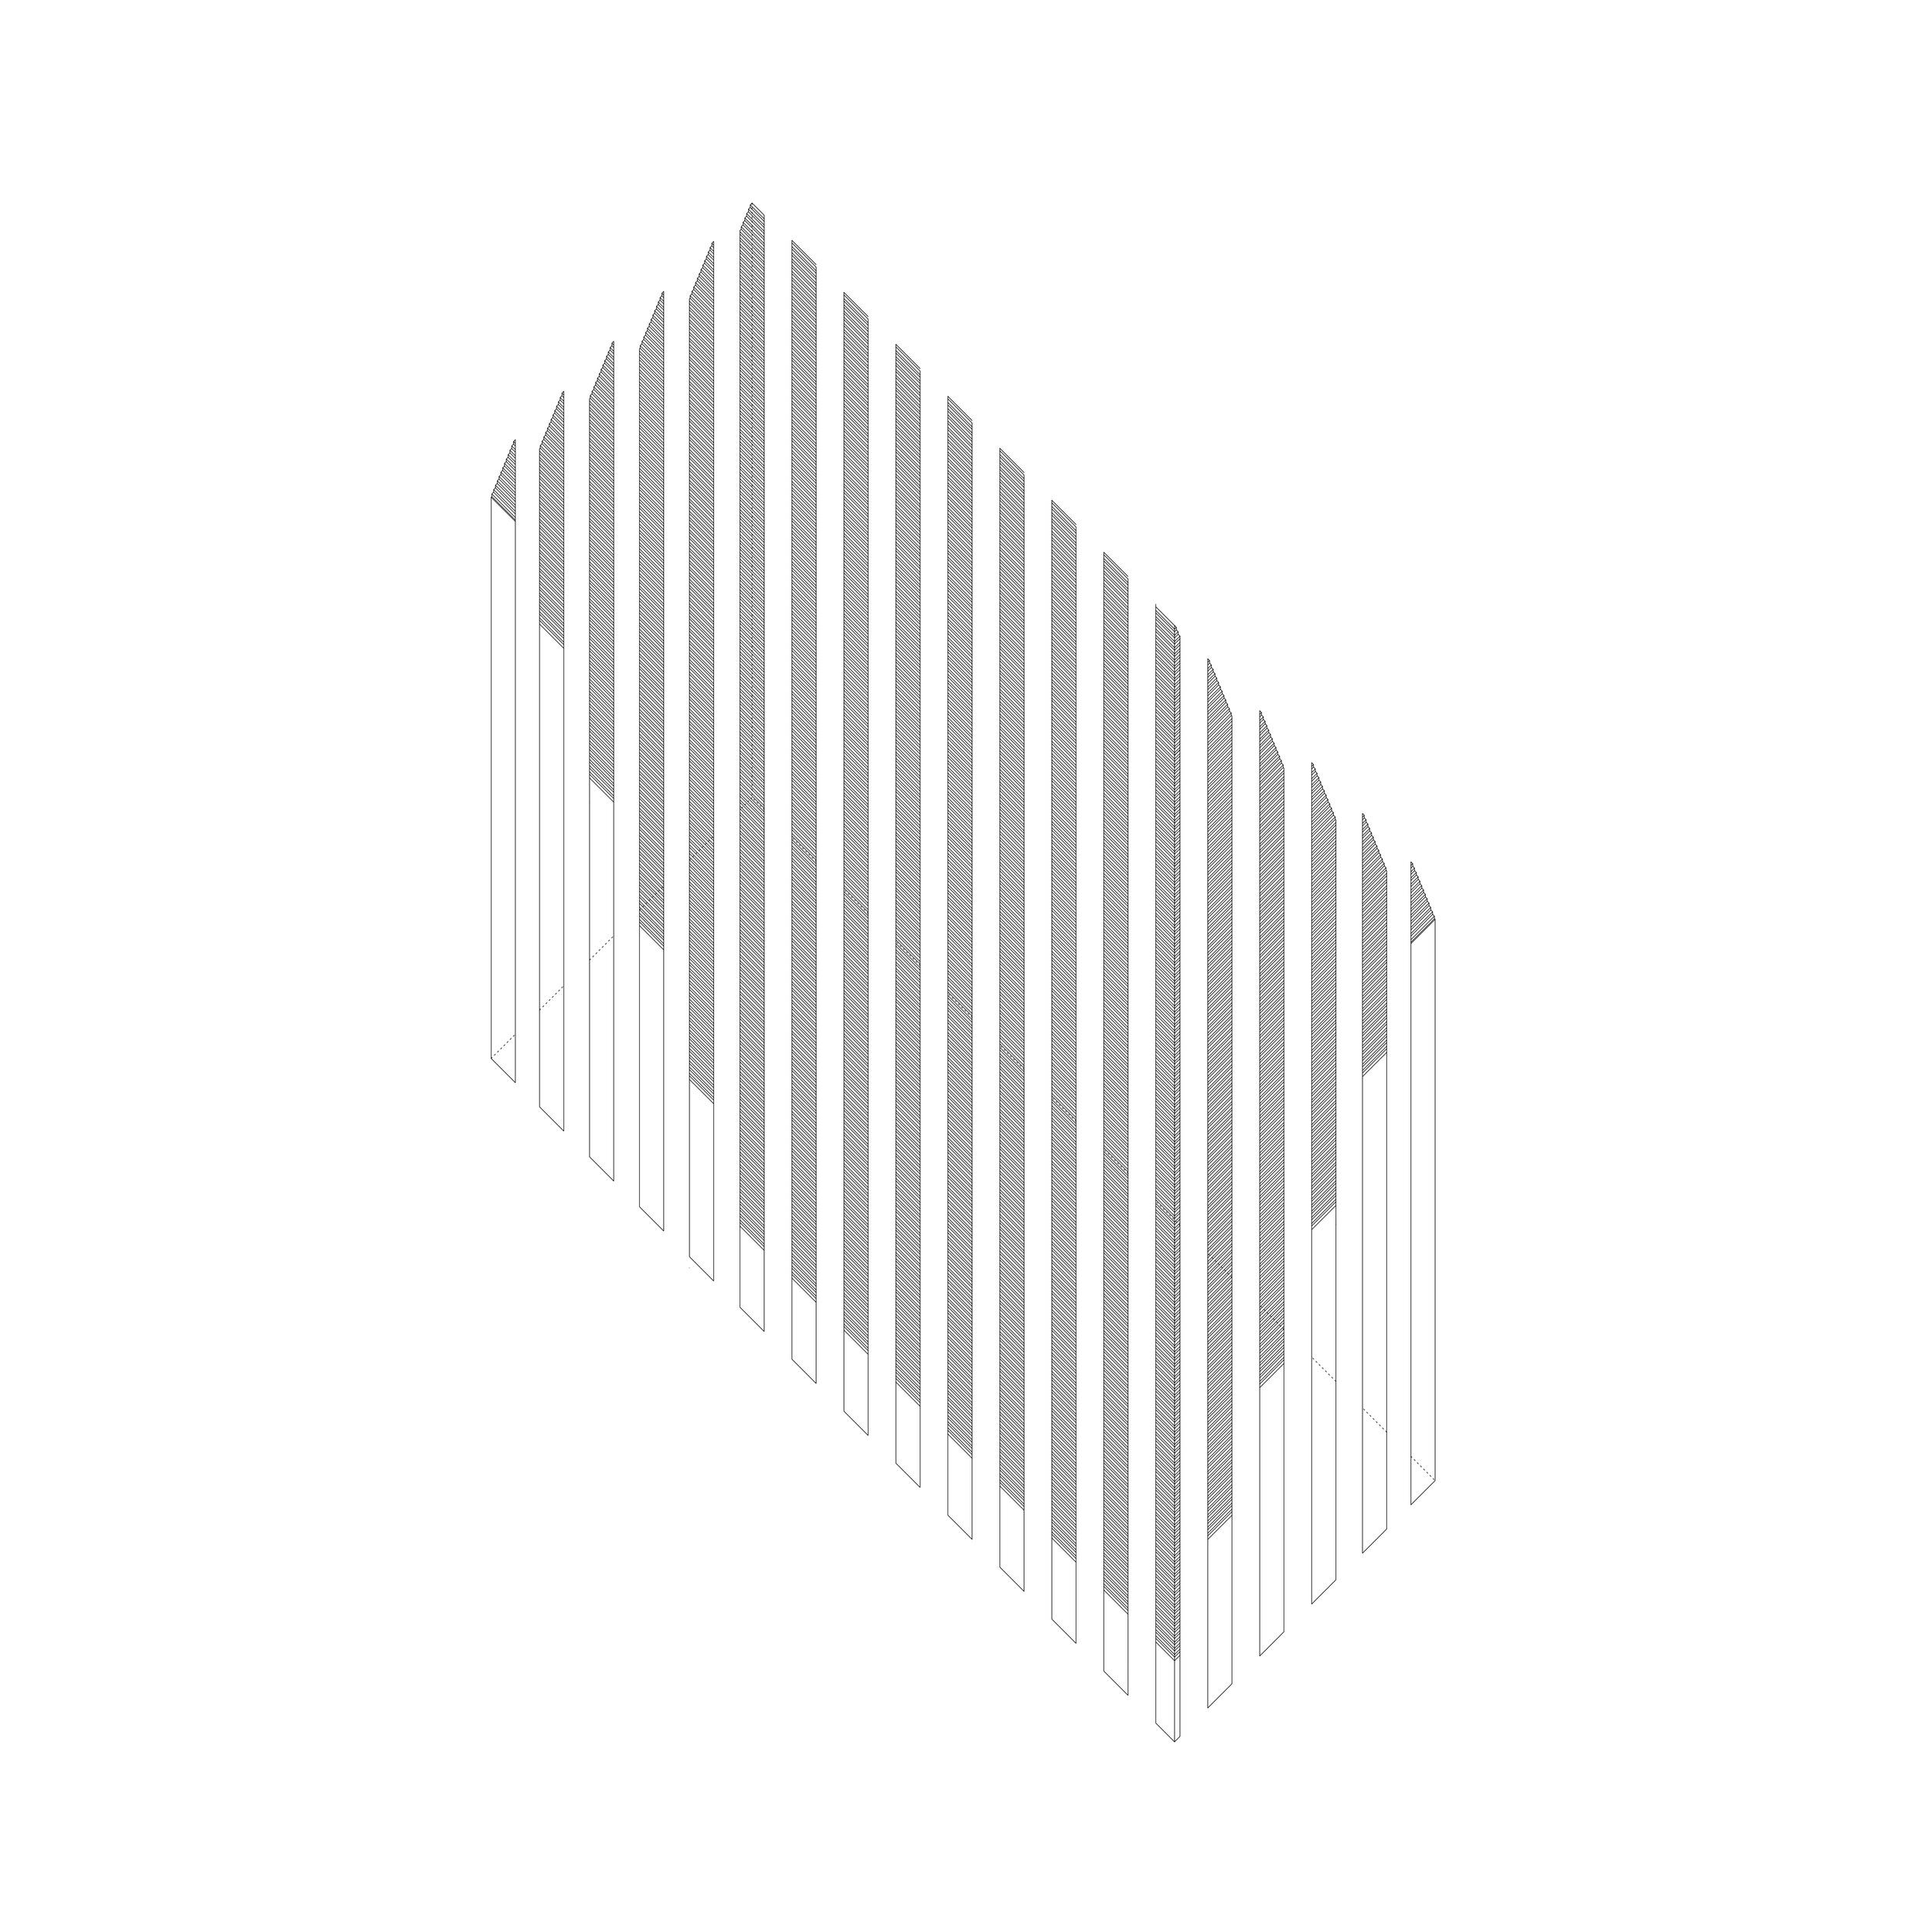 Swerdlin_Exercise1Final3.jpg